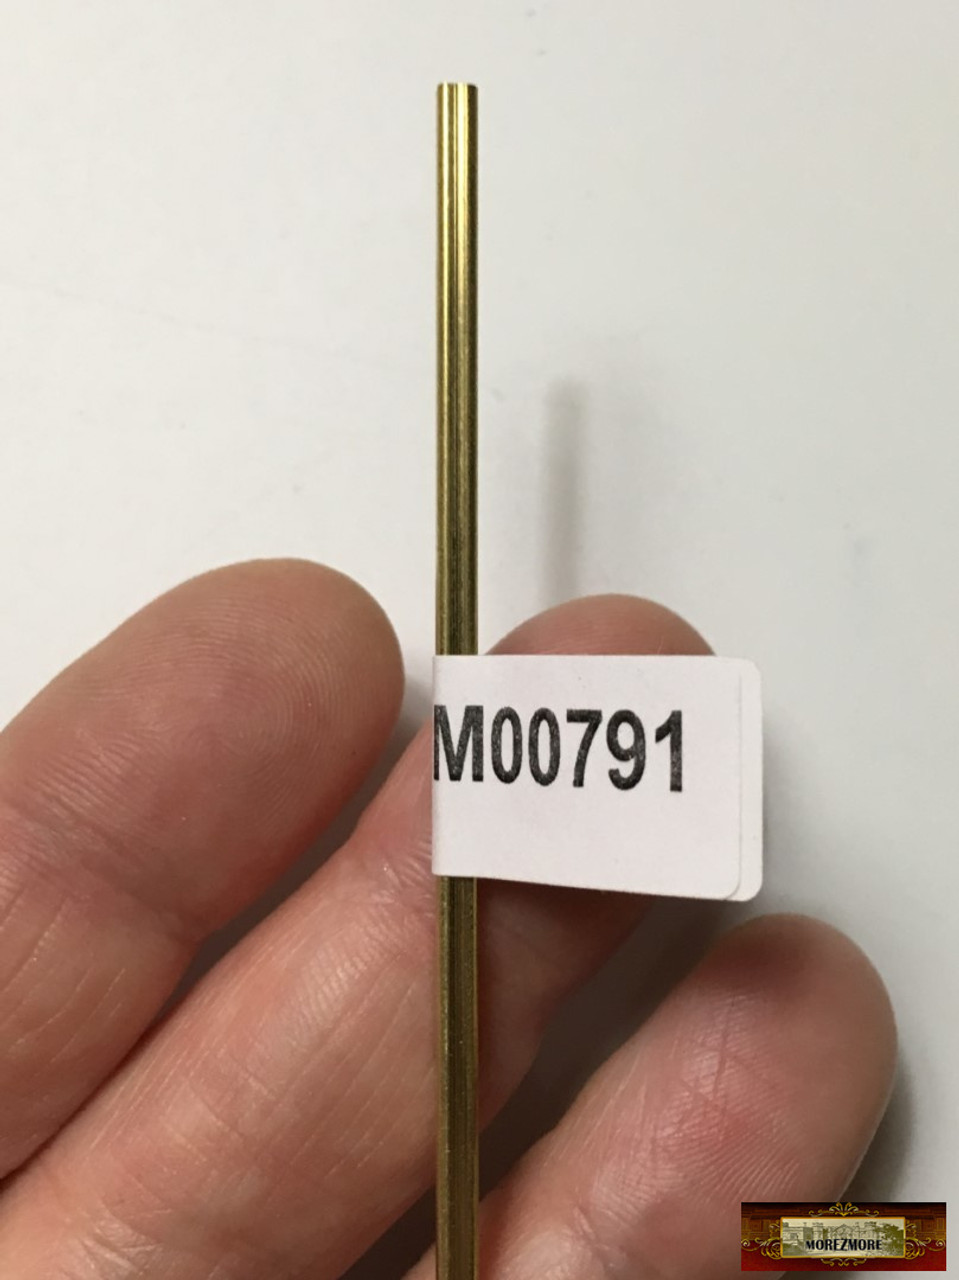 M01305 MOREZMORE 2 Telescopic Brass Round Tube #9821 #9822 3mm 4mm K/&S